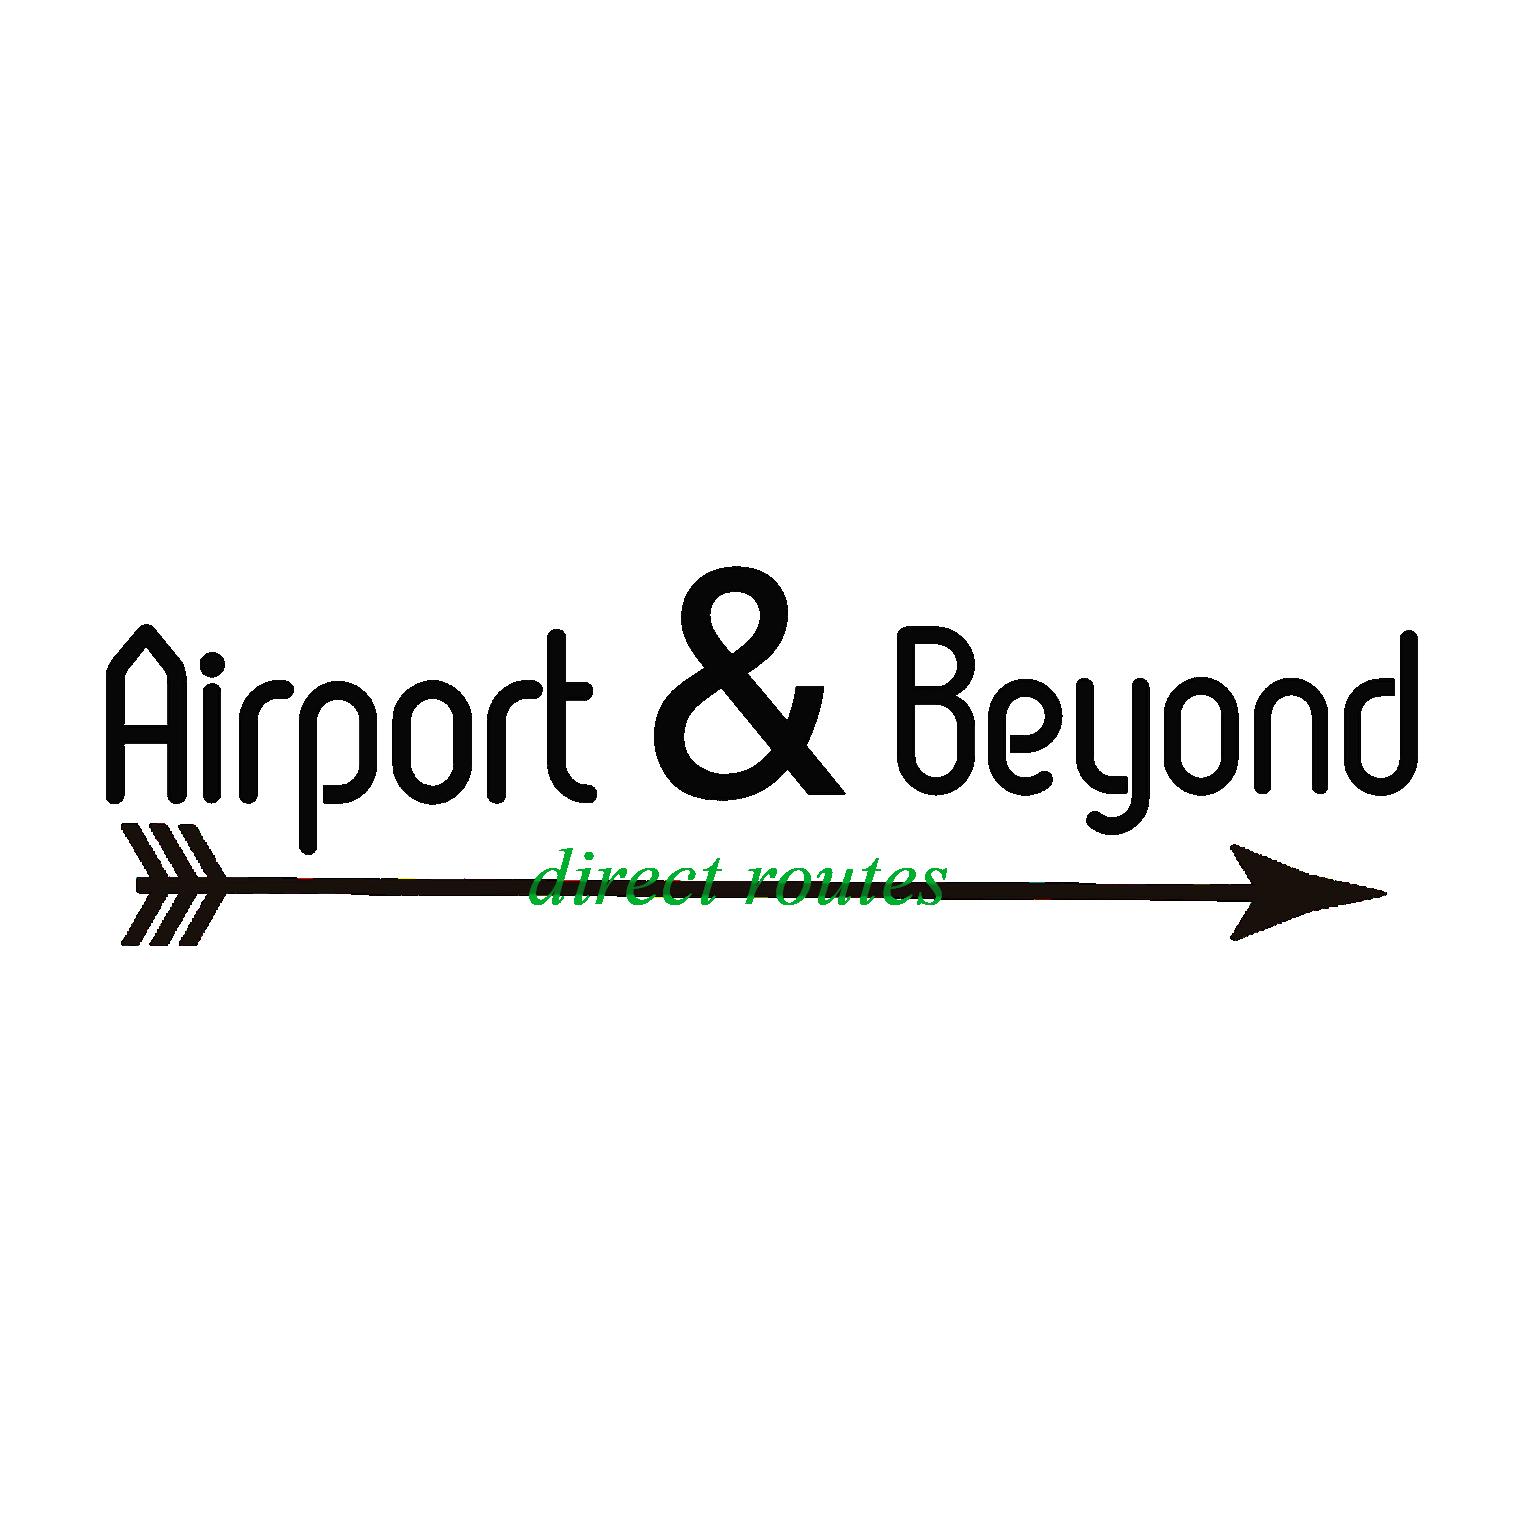 Airport & Beyond, LLC image 2